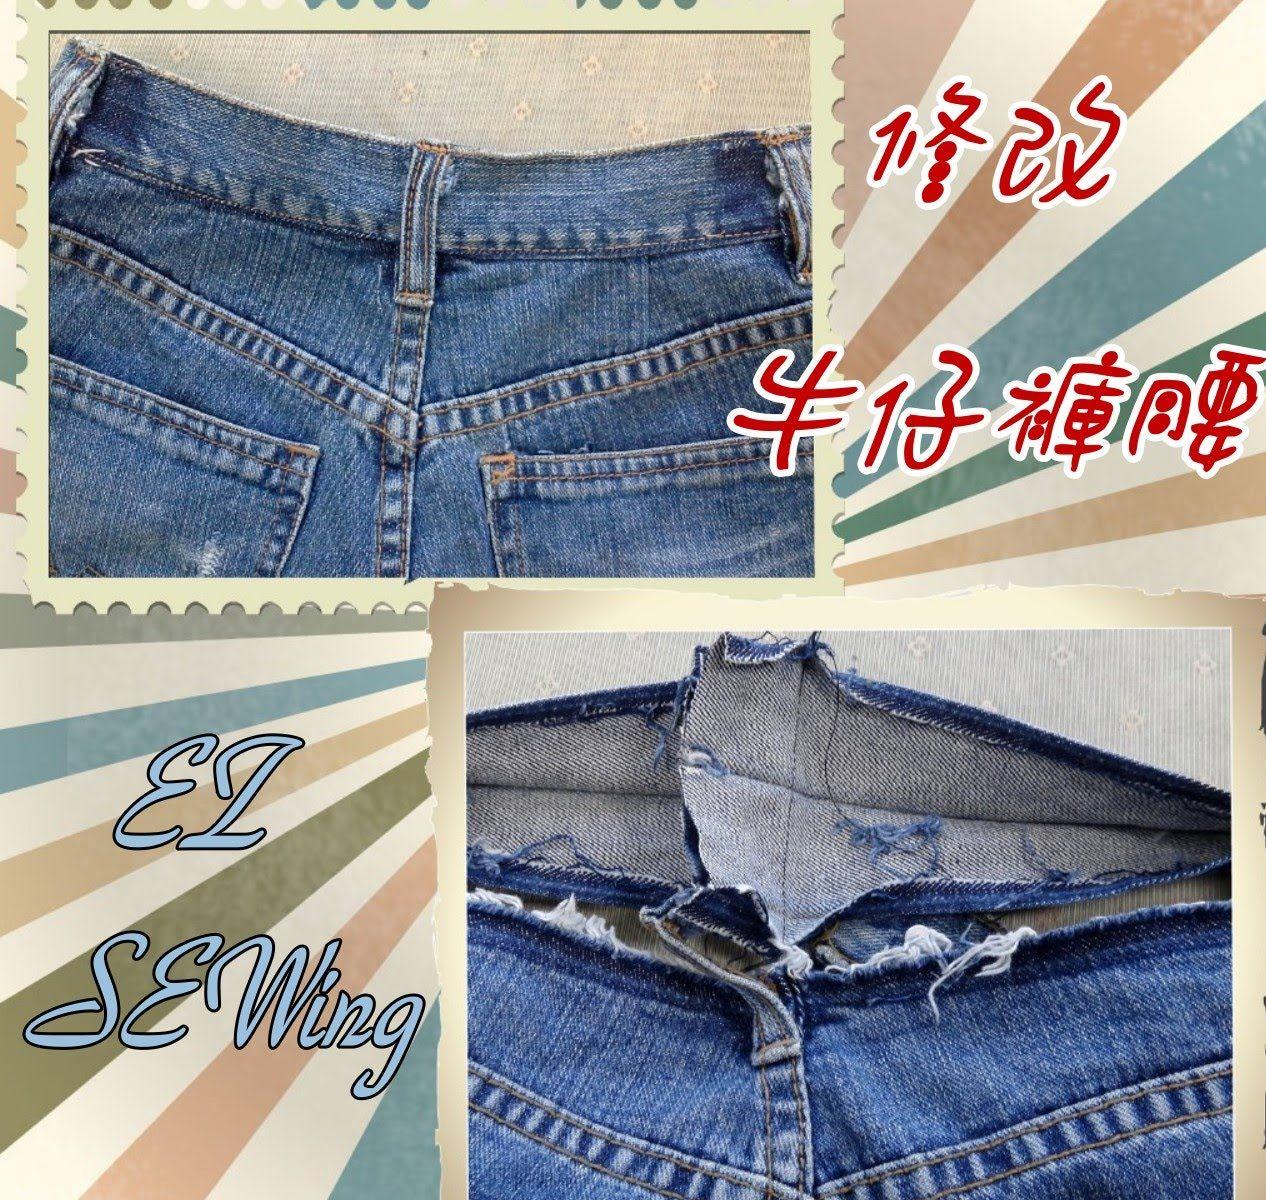 修改 牛仔褲腰   Pants. Fashion. Skinny jeans